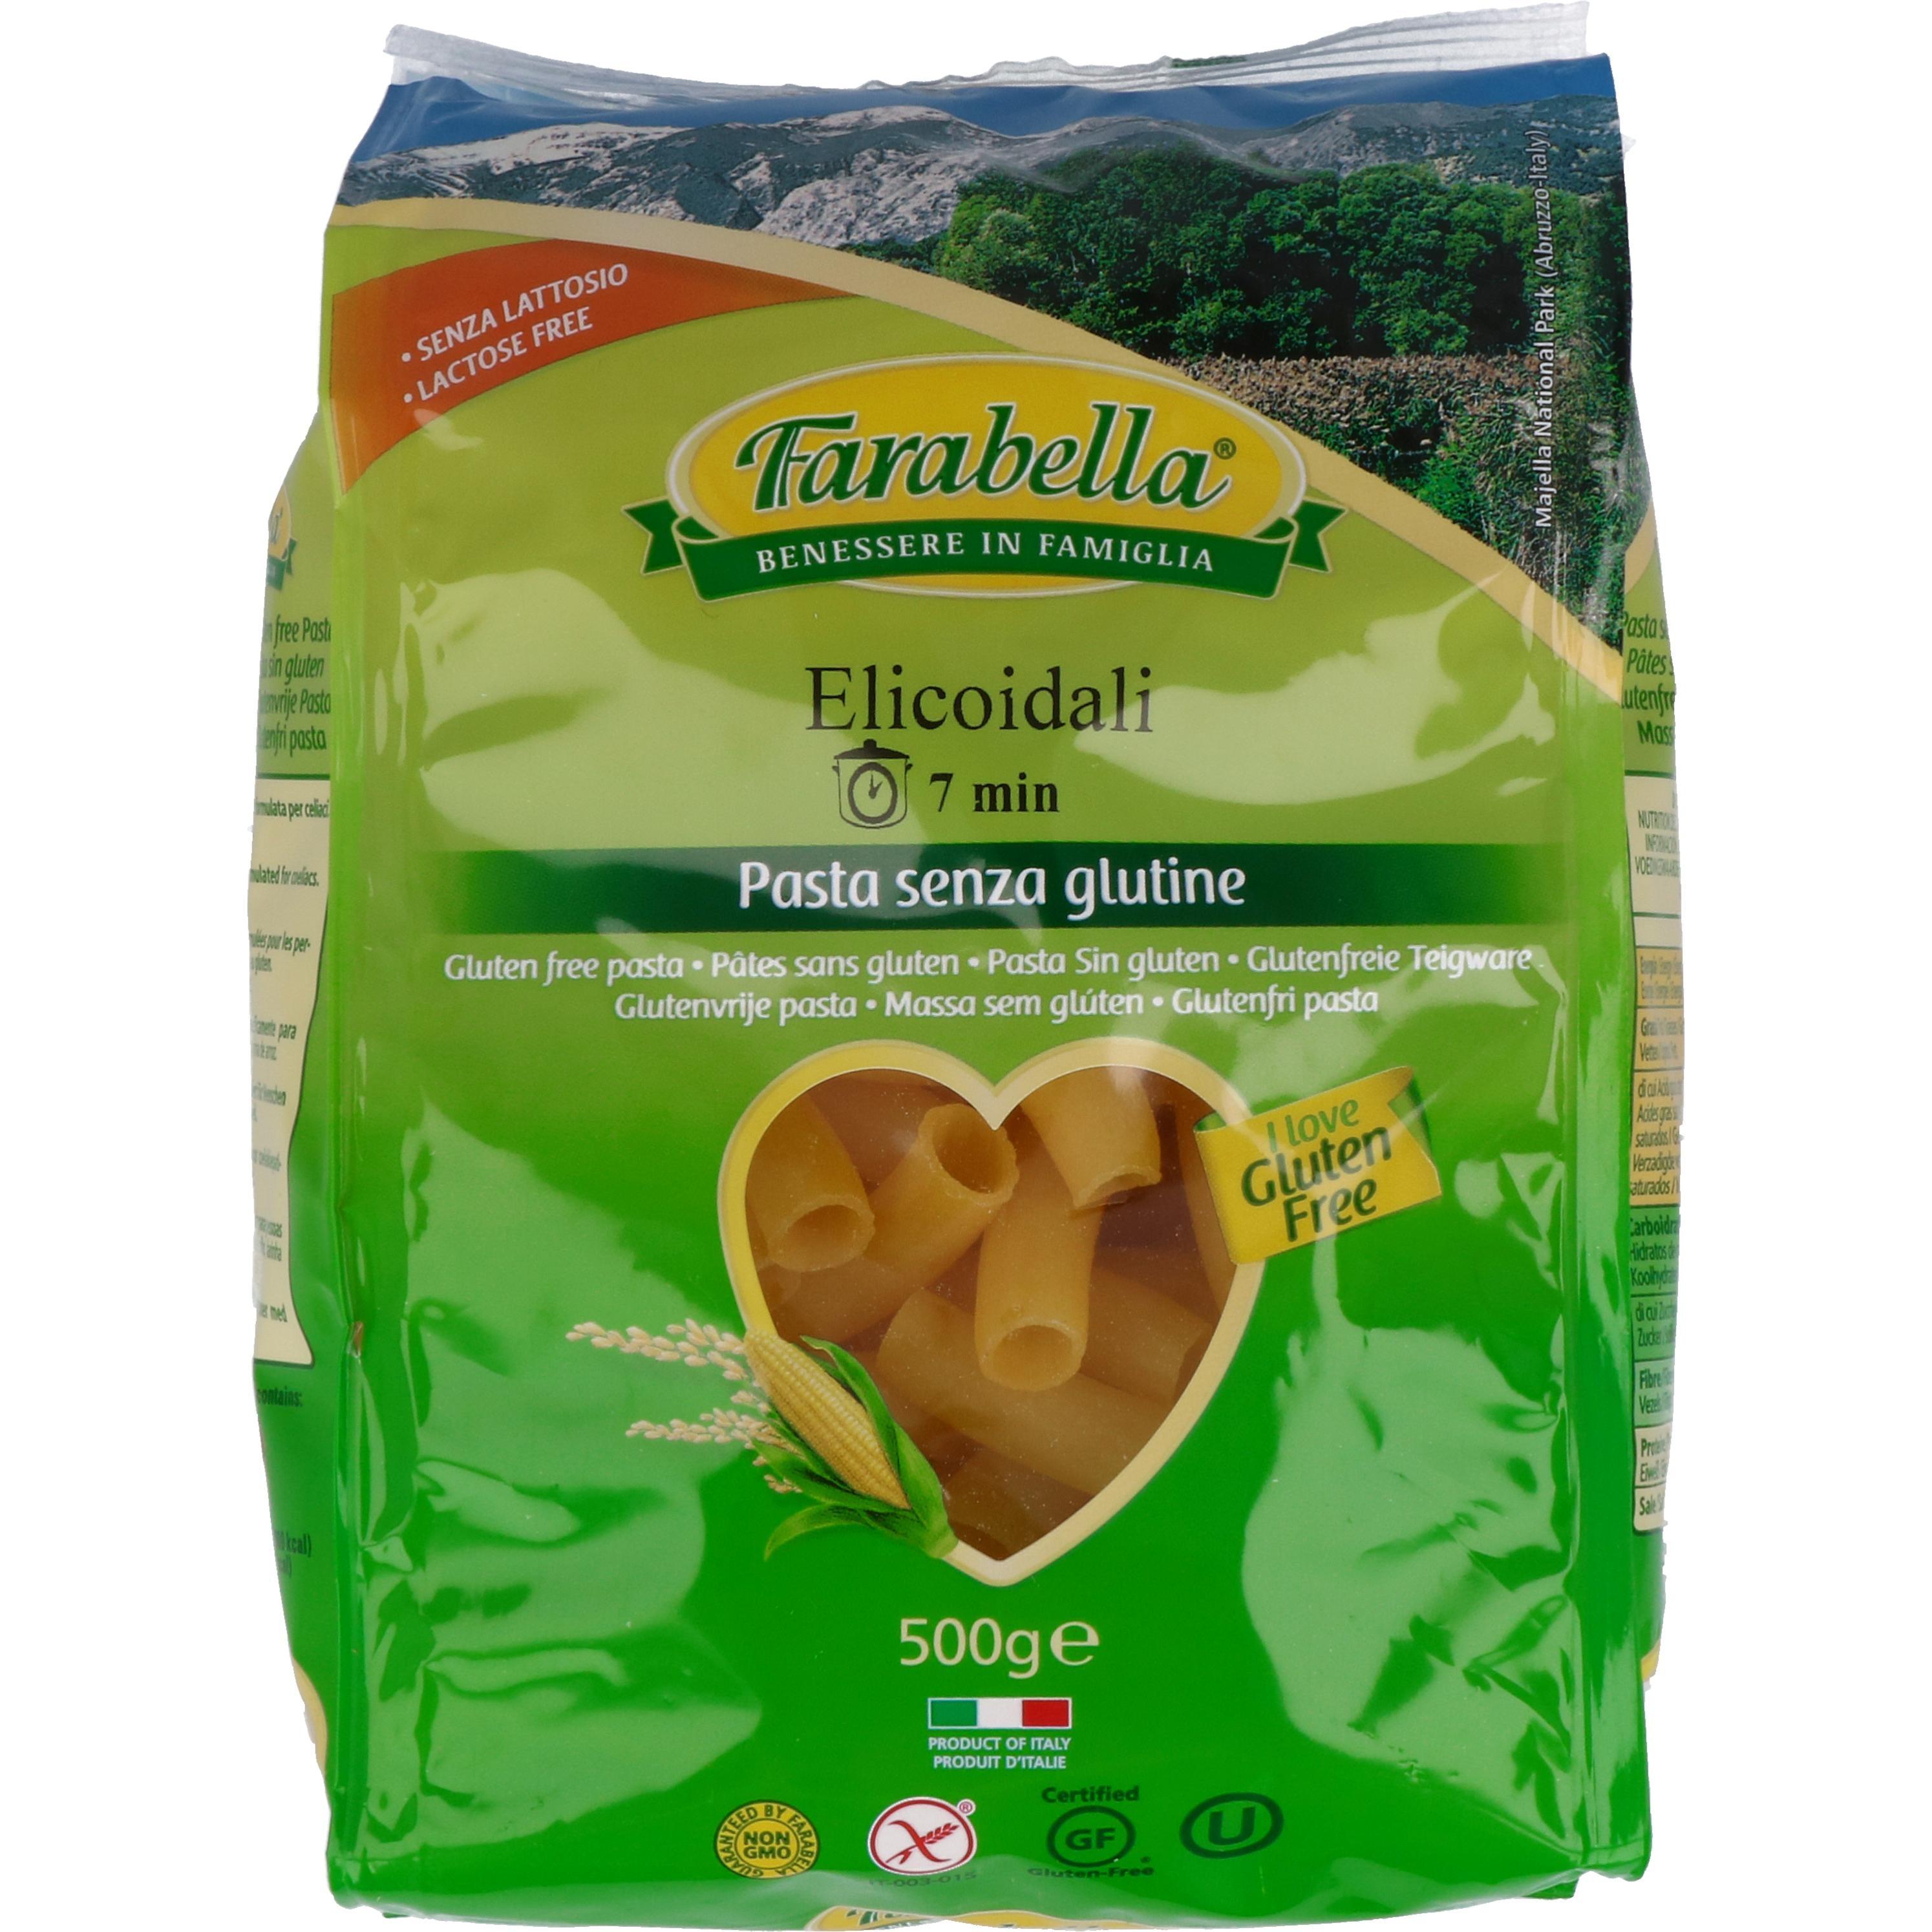 Farabella Elicoidali Rigatoni 500g